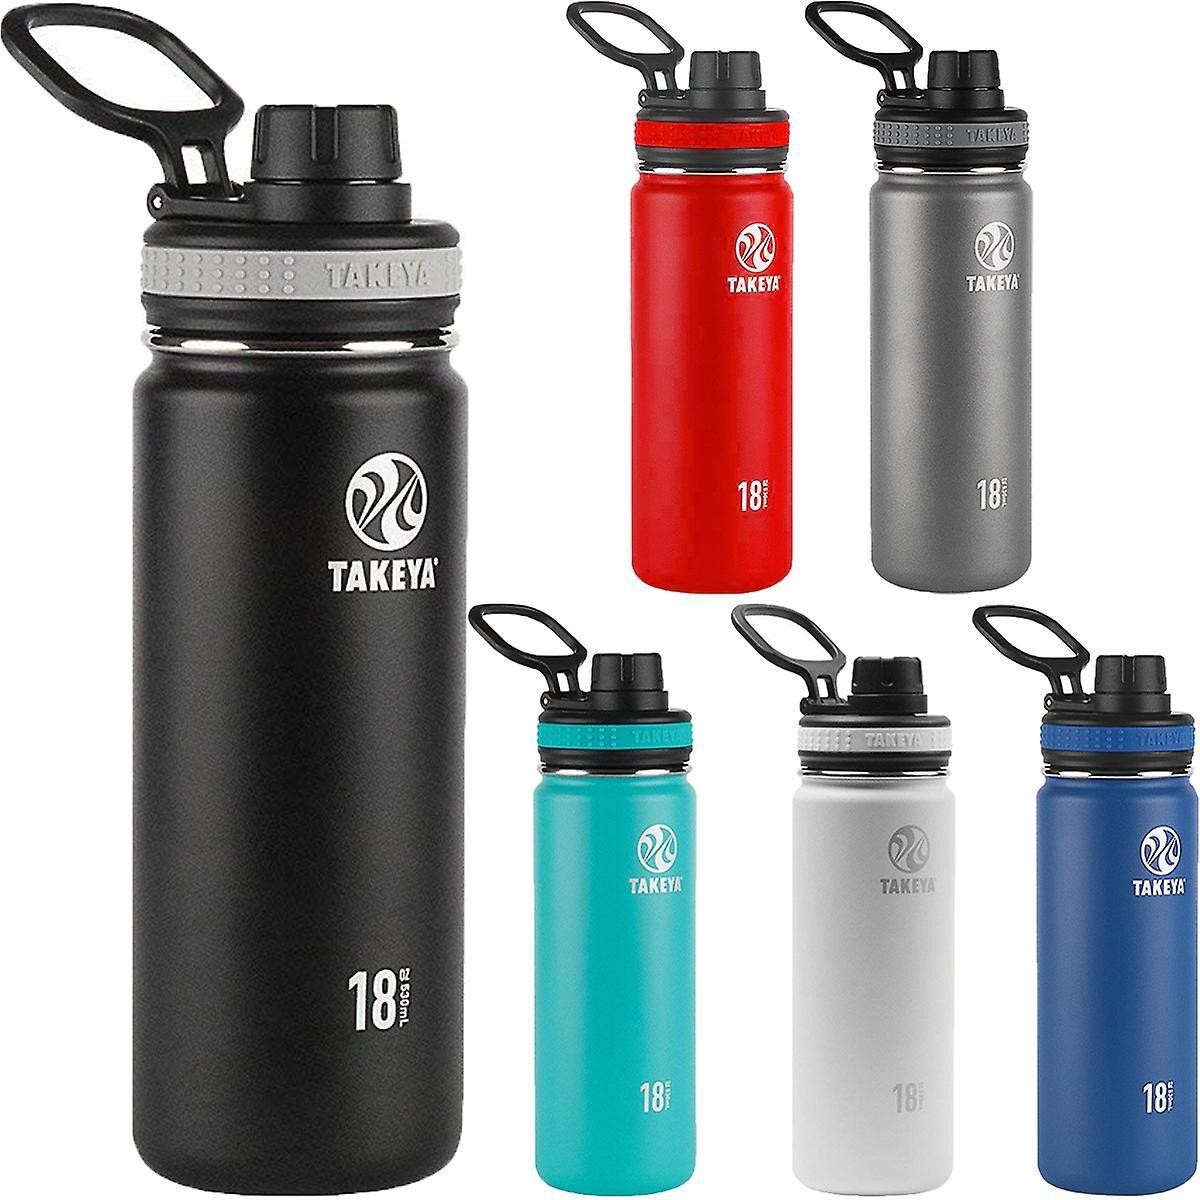 Takeya Bouteille d'eau en acier inoxydable isotherme 18 oz Takeya originaux